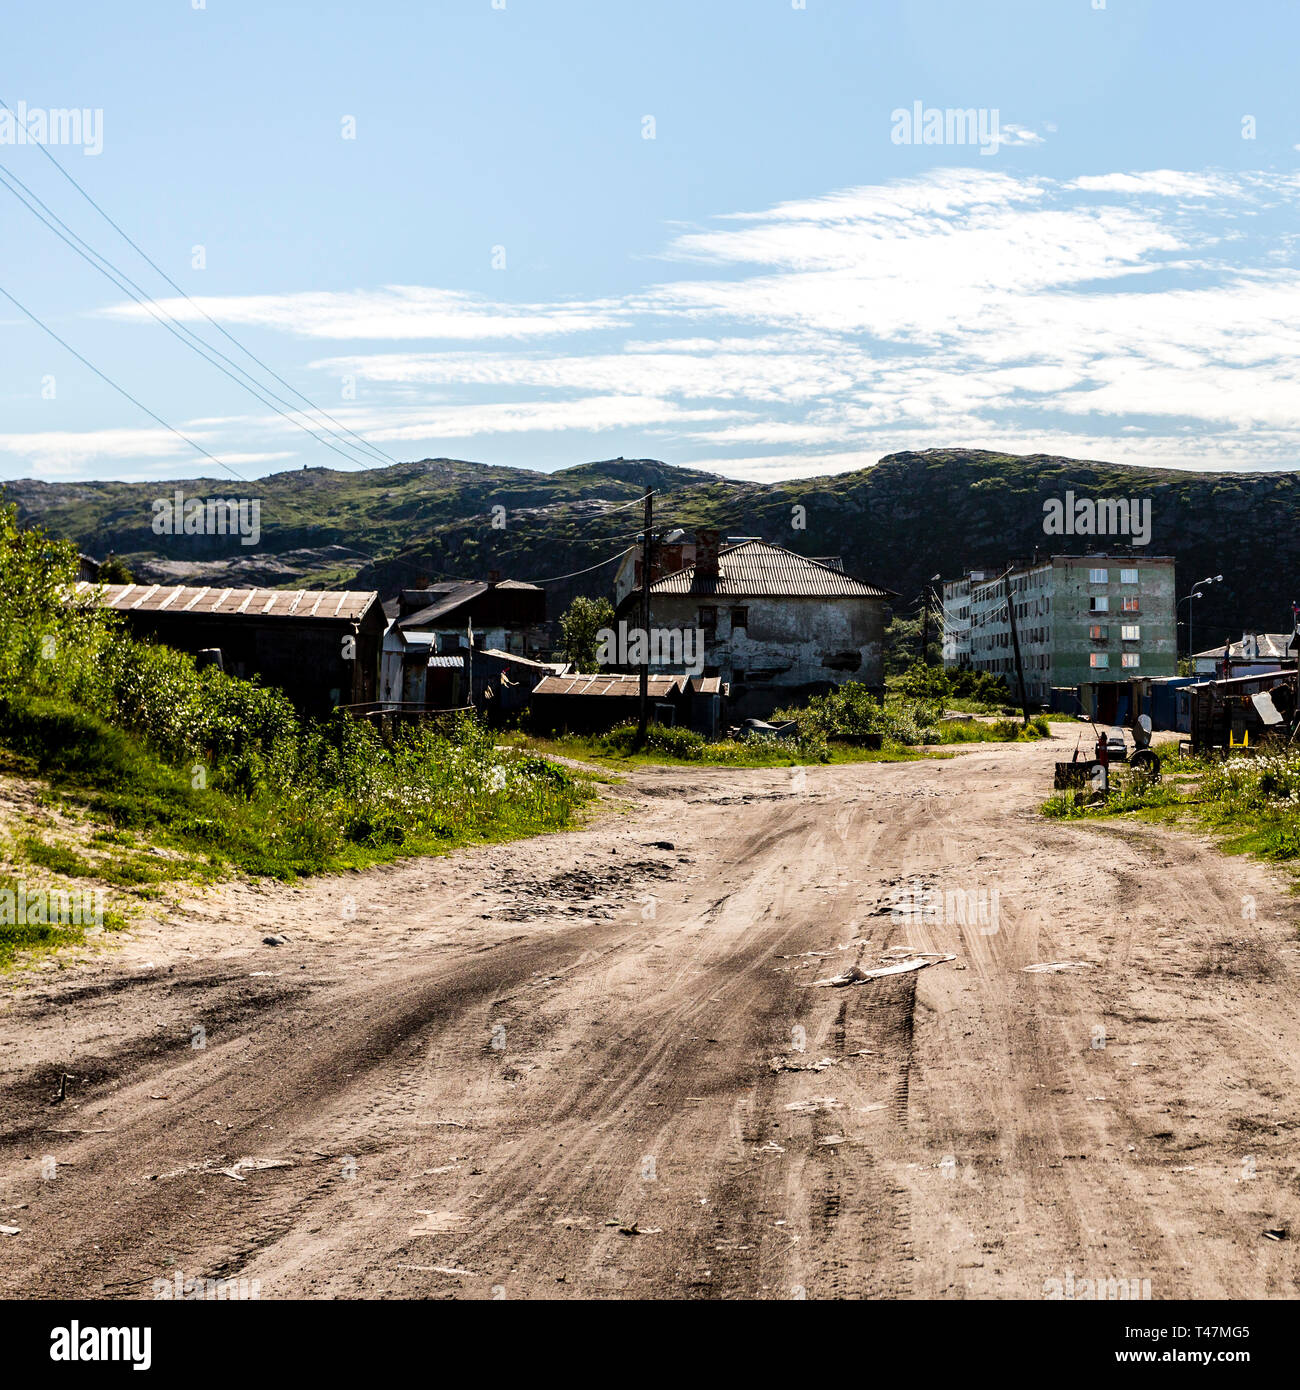 Street in rural locality village Teriberka in Kolsky District of Murmansk Oblast, Russia - Stock Image